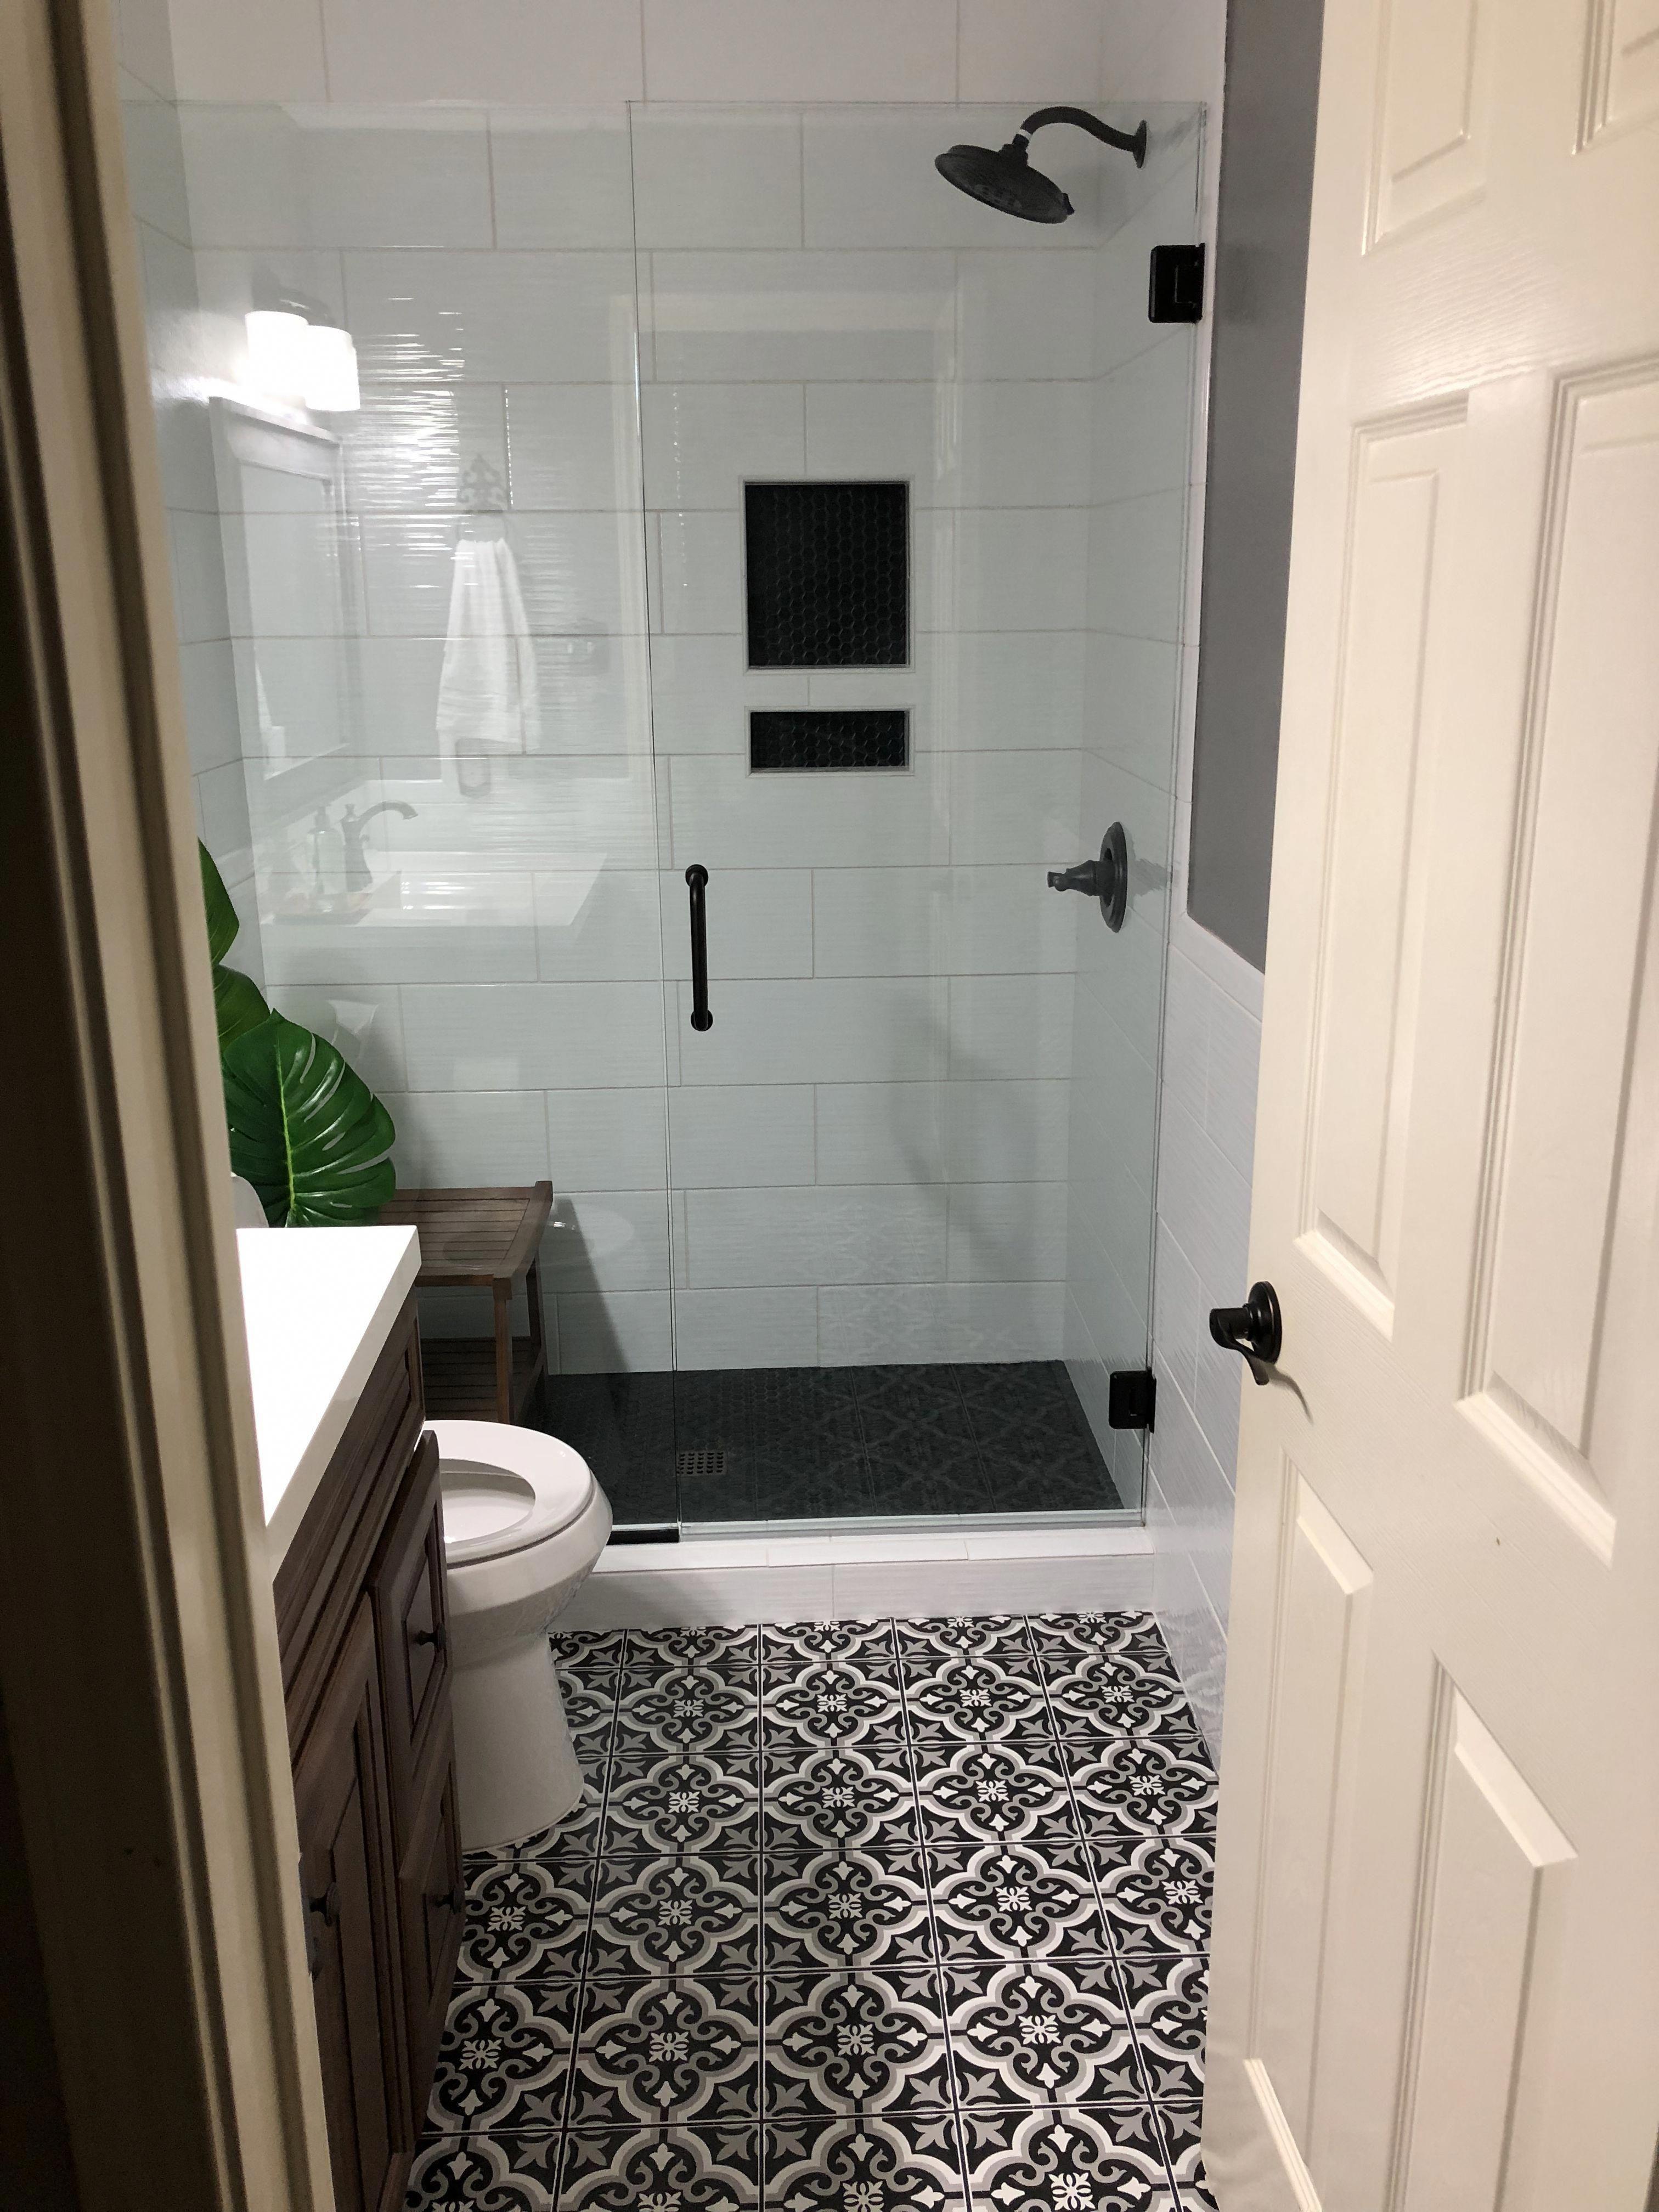 30 Cool Basement Bathroom Ideas Basementbathroomideas Basement Bathroom Decor Bathroom Baseme Bathroom Design Small Small Bathroom Inspiration Small Bathroom